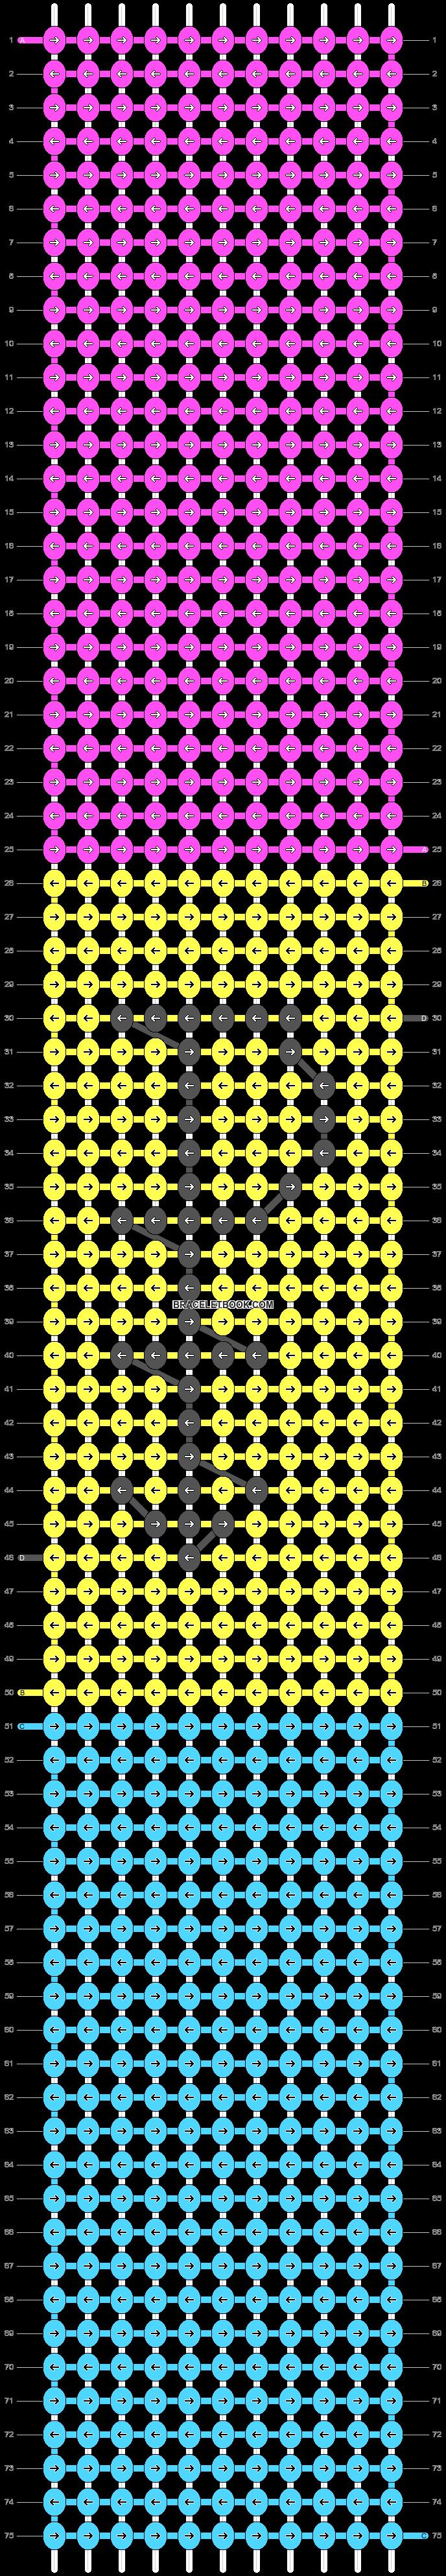 Alpha pattern #16150 pattern